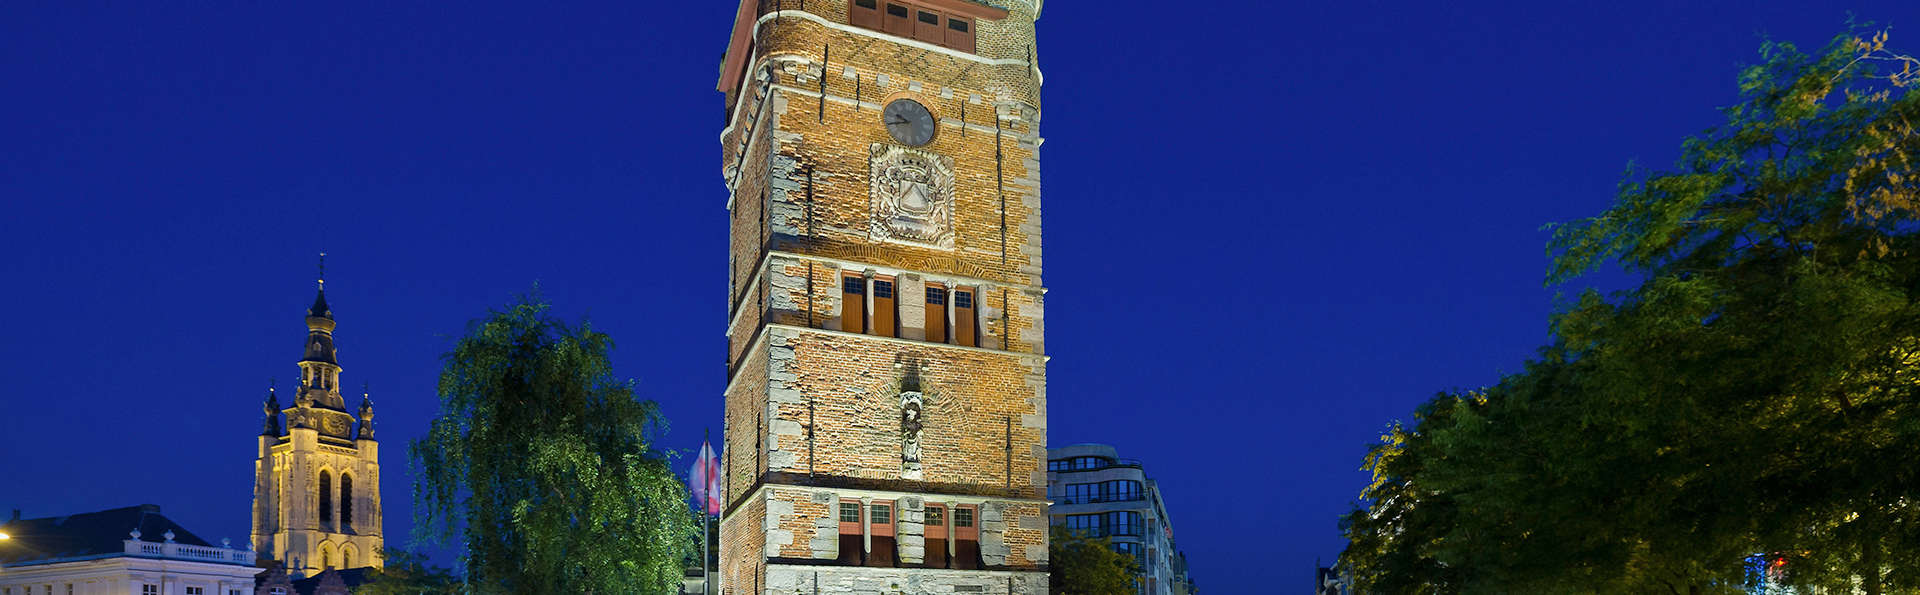 Hotel Ibis Kortrijk - Edit_Destination.jpg